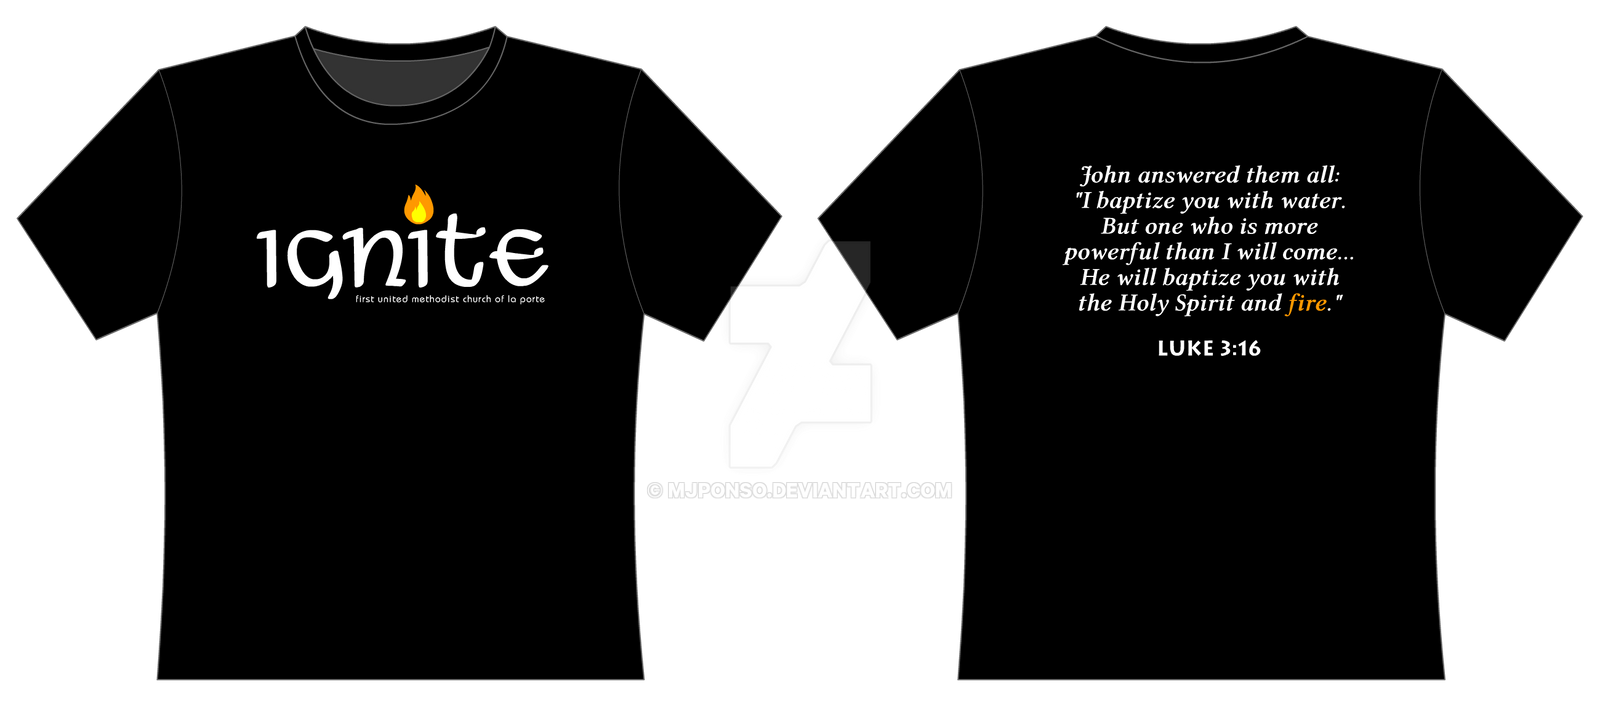 T shirt design youth -  Ignite T Shirt Design By Mjponso